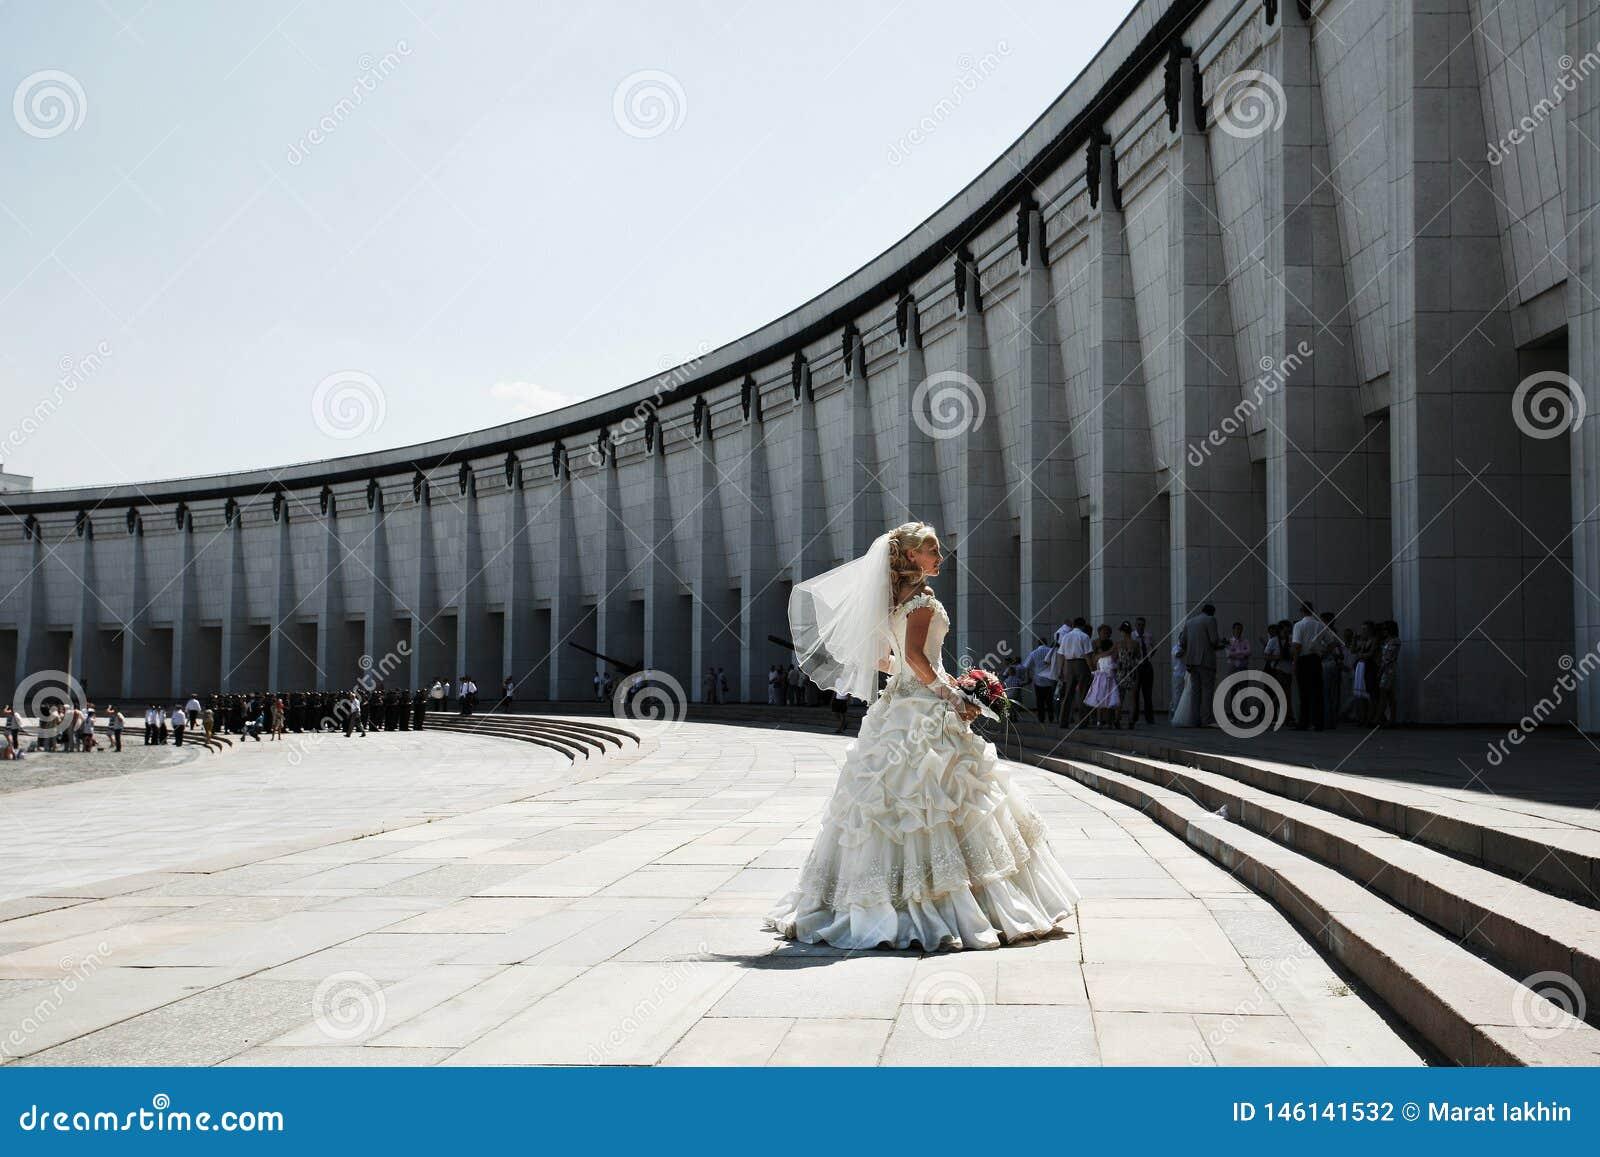 Bride dancing at Victory park